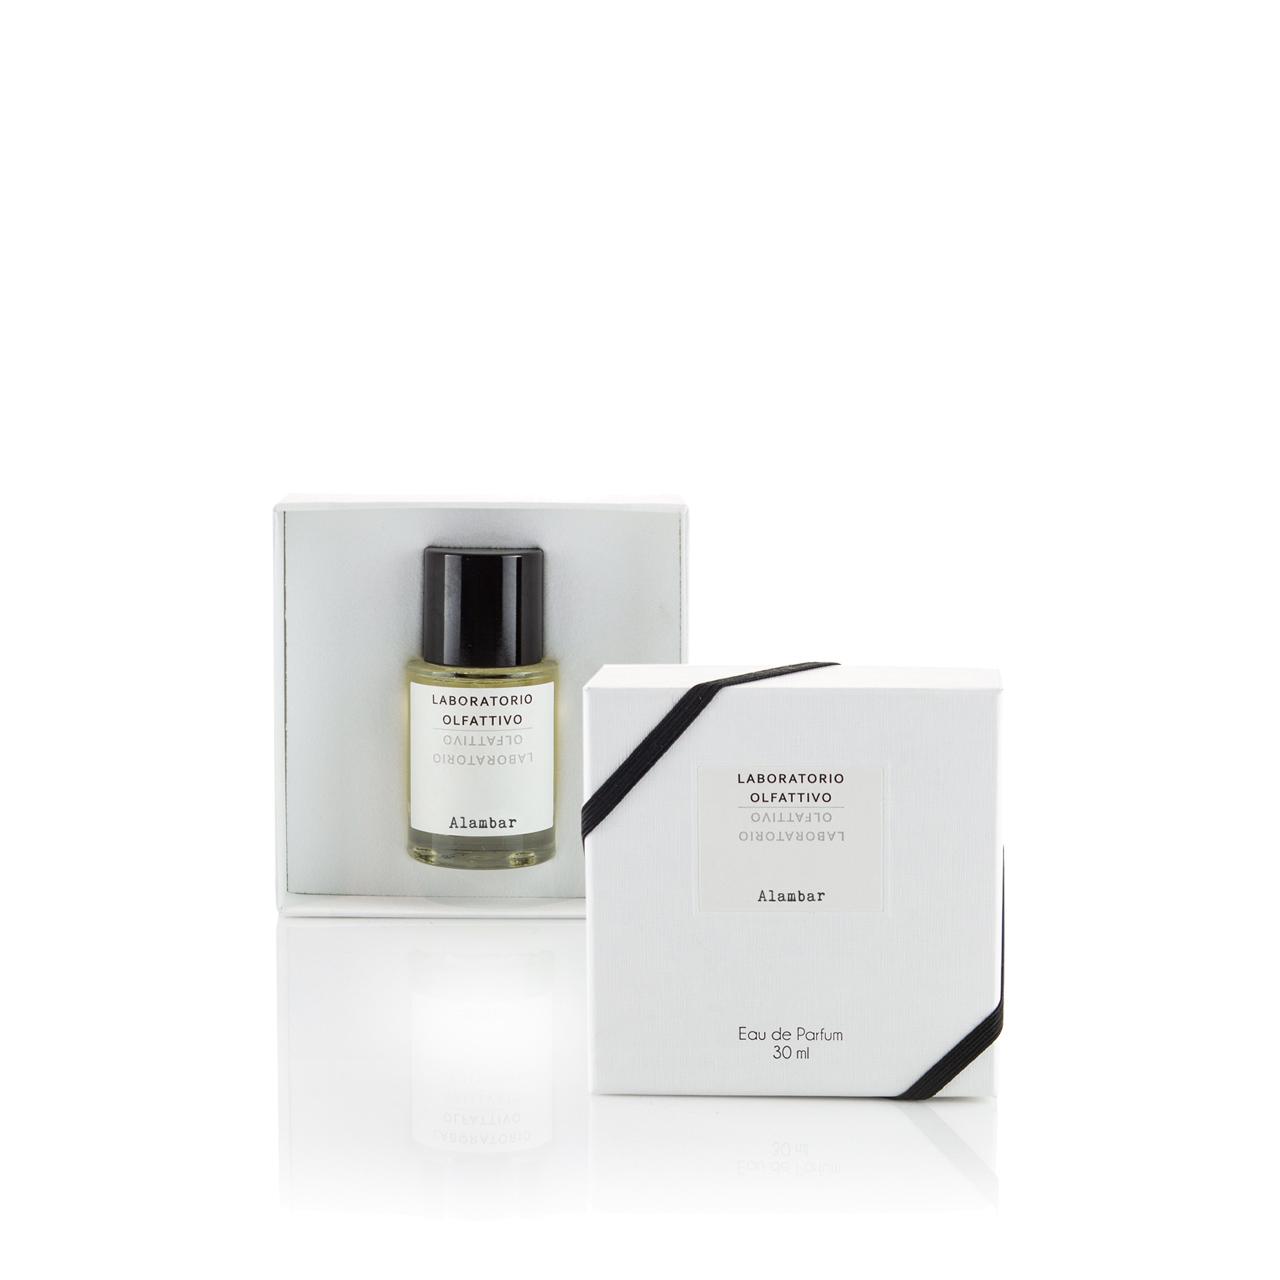 Alambar - Eau de Parfum